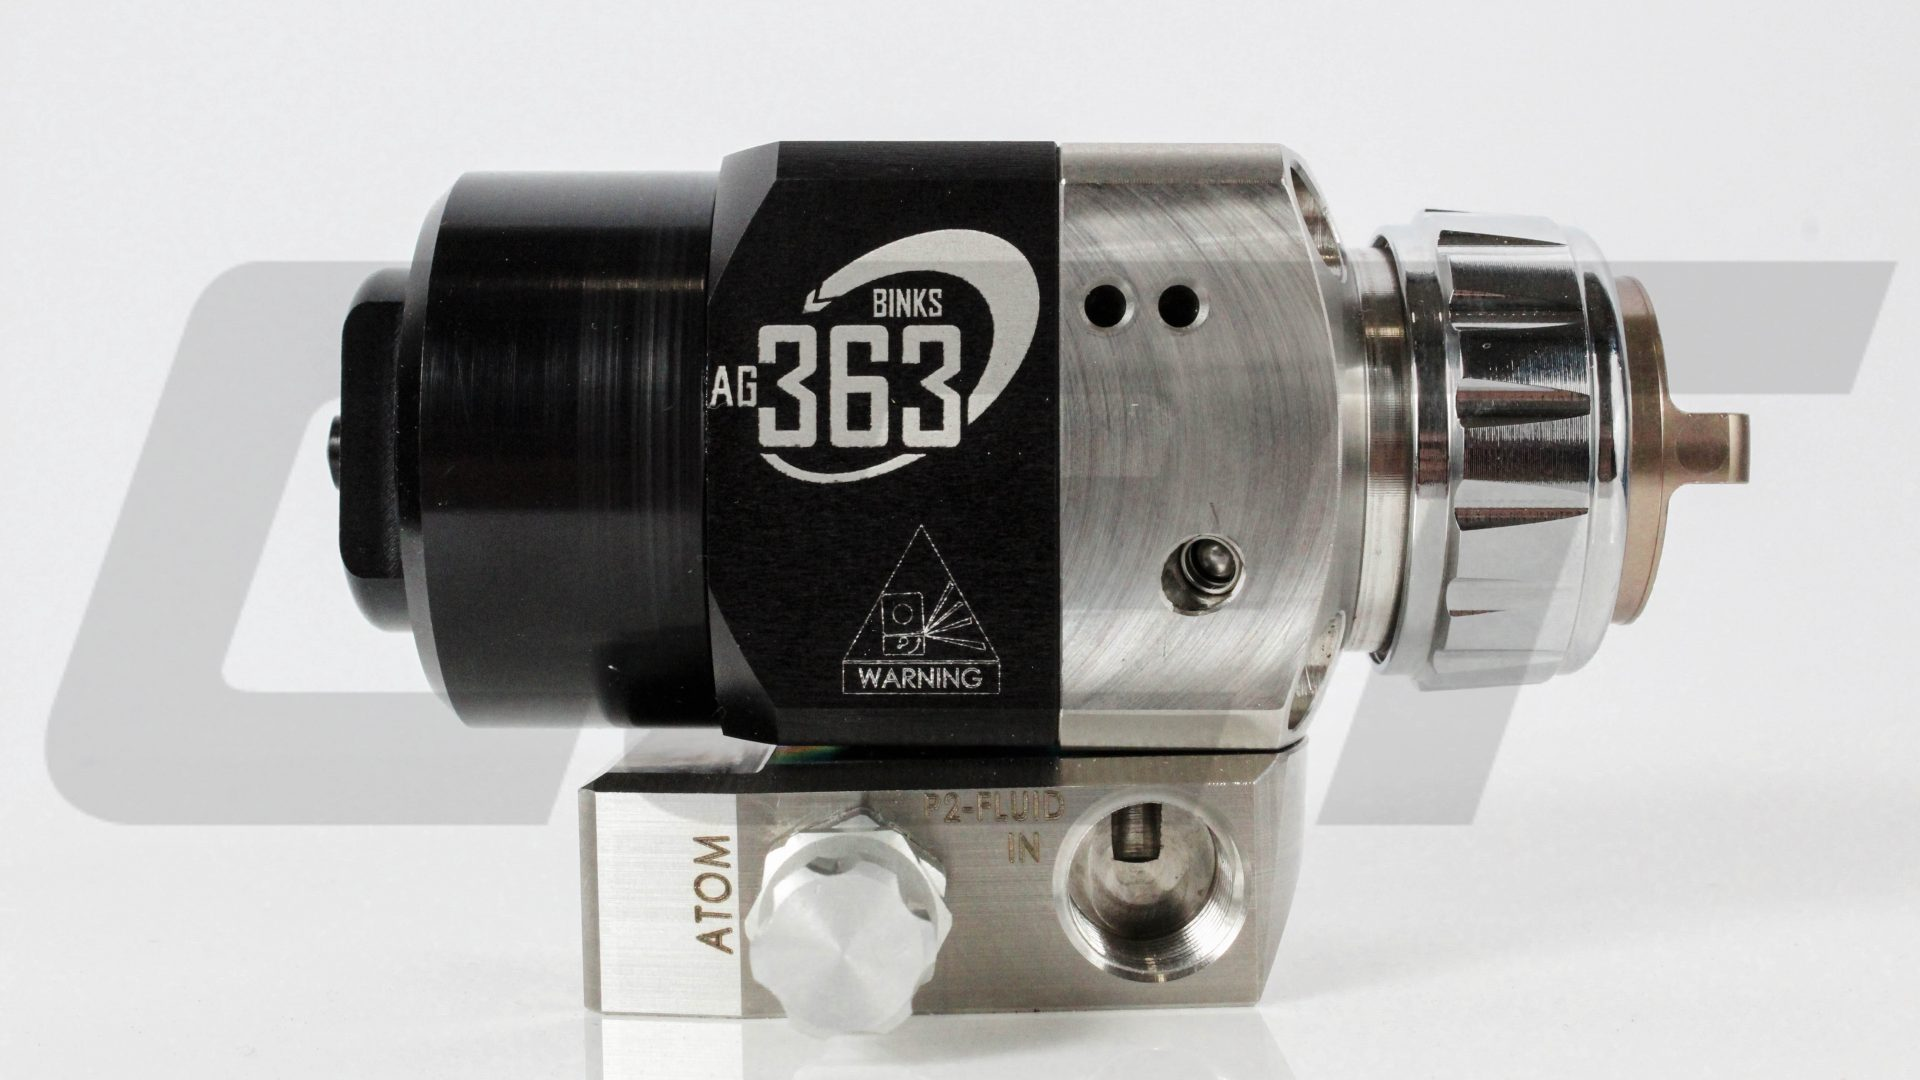 AG-363